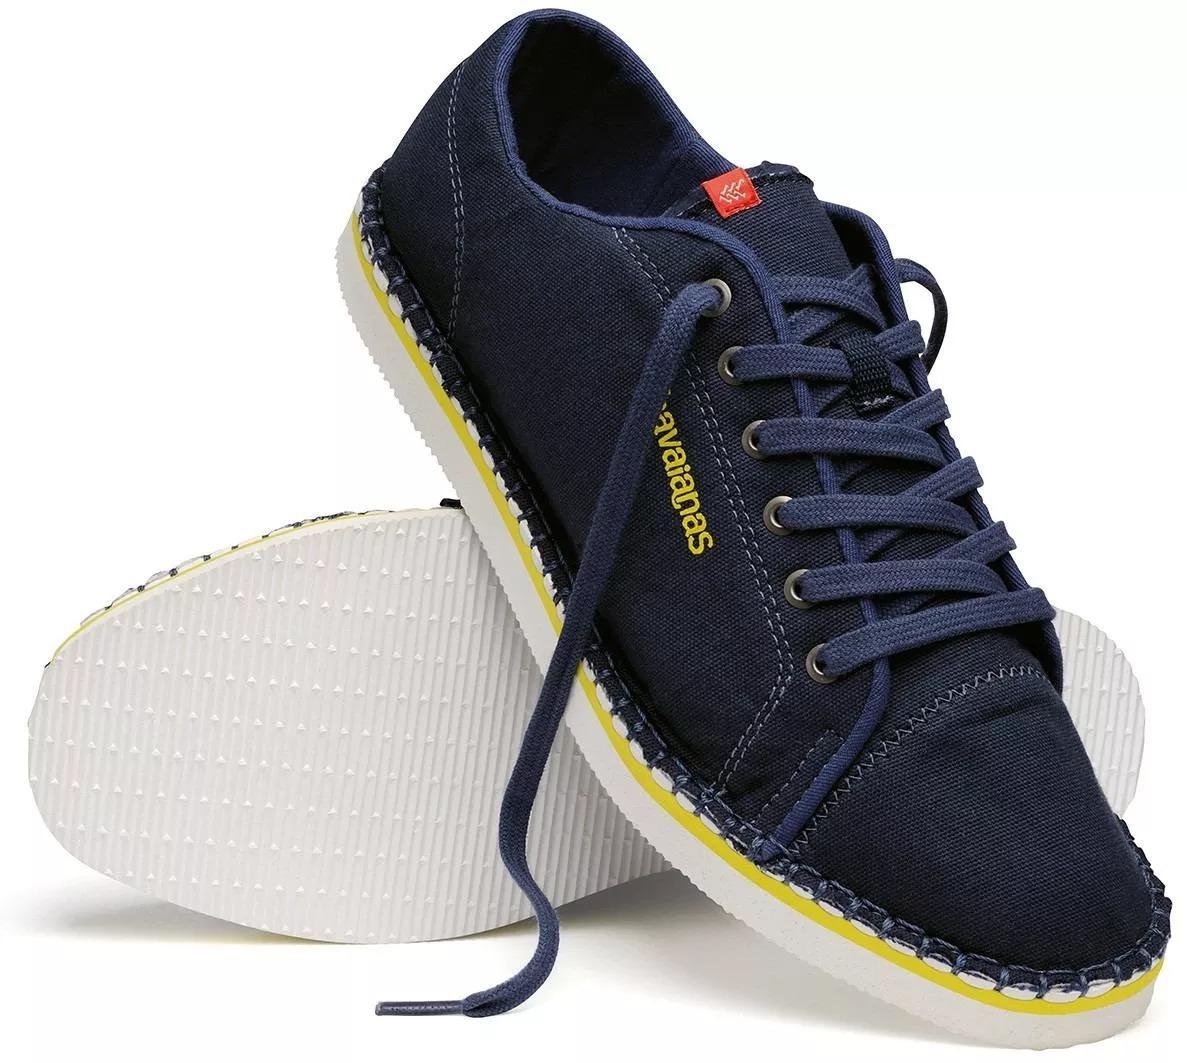 38e7a33718 havaianas alpargata sneaker layers iii azul marinho. Carregando zoom.